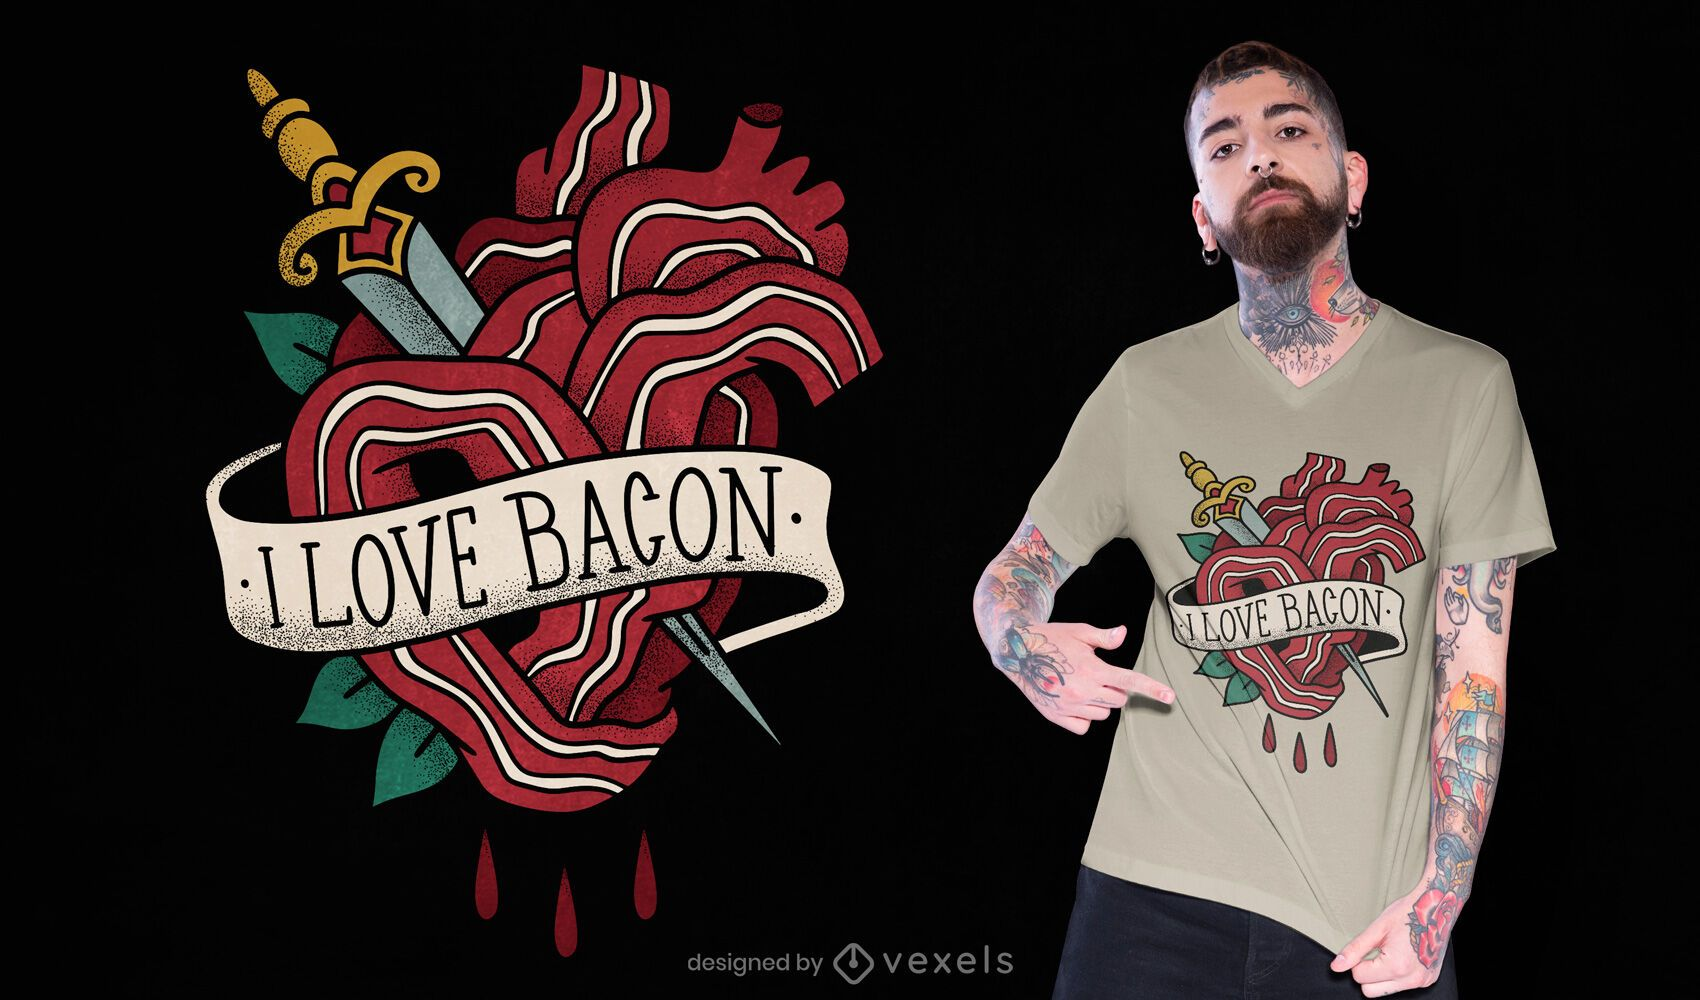 I love bacon tattoo t-shirt design